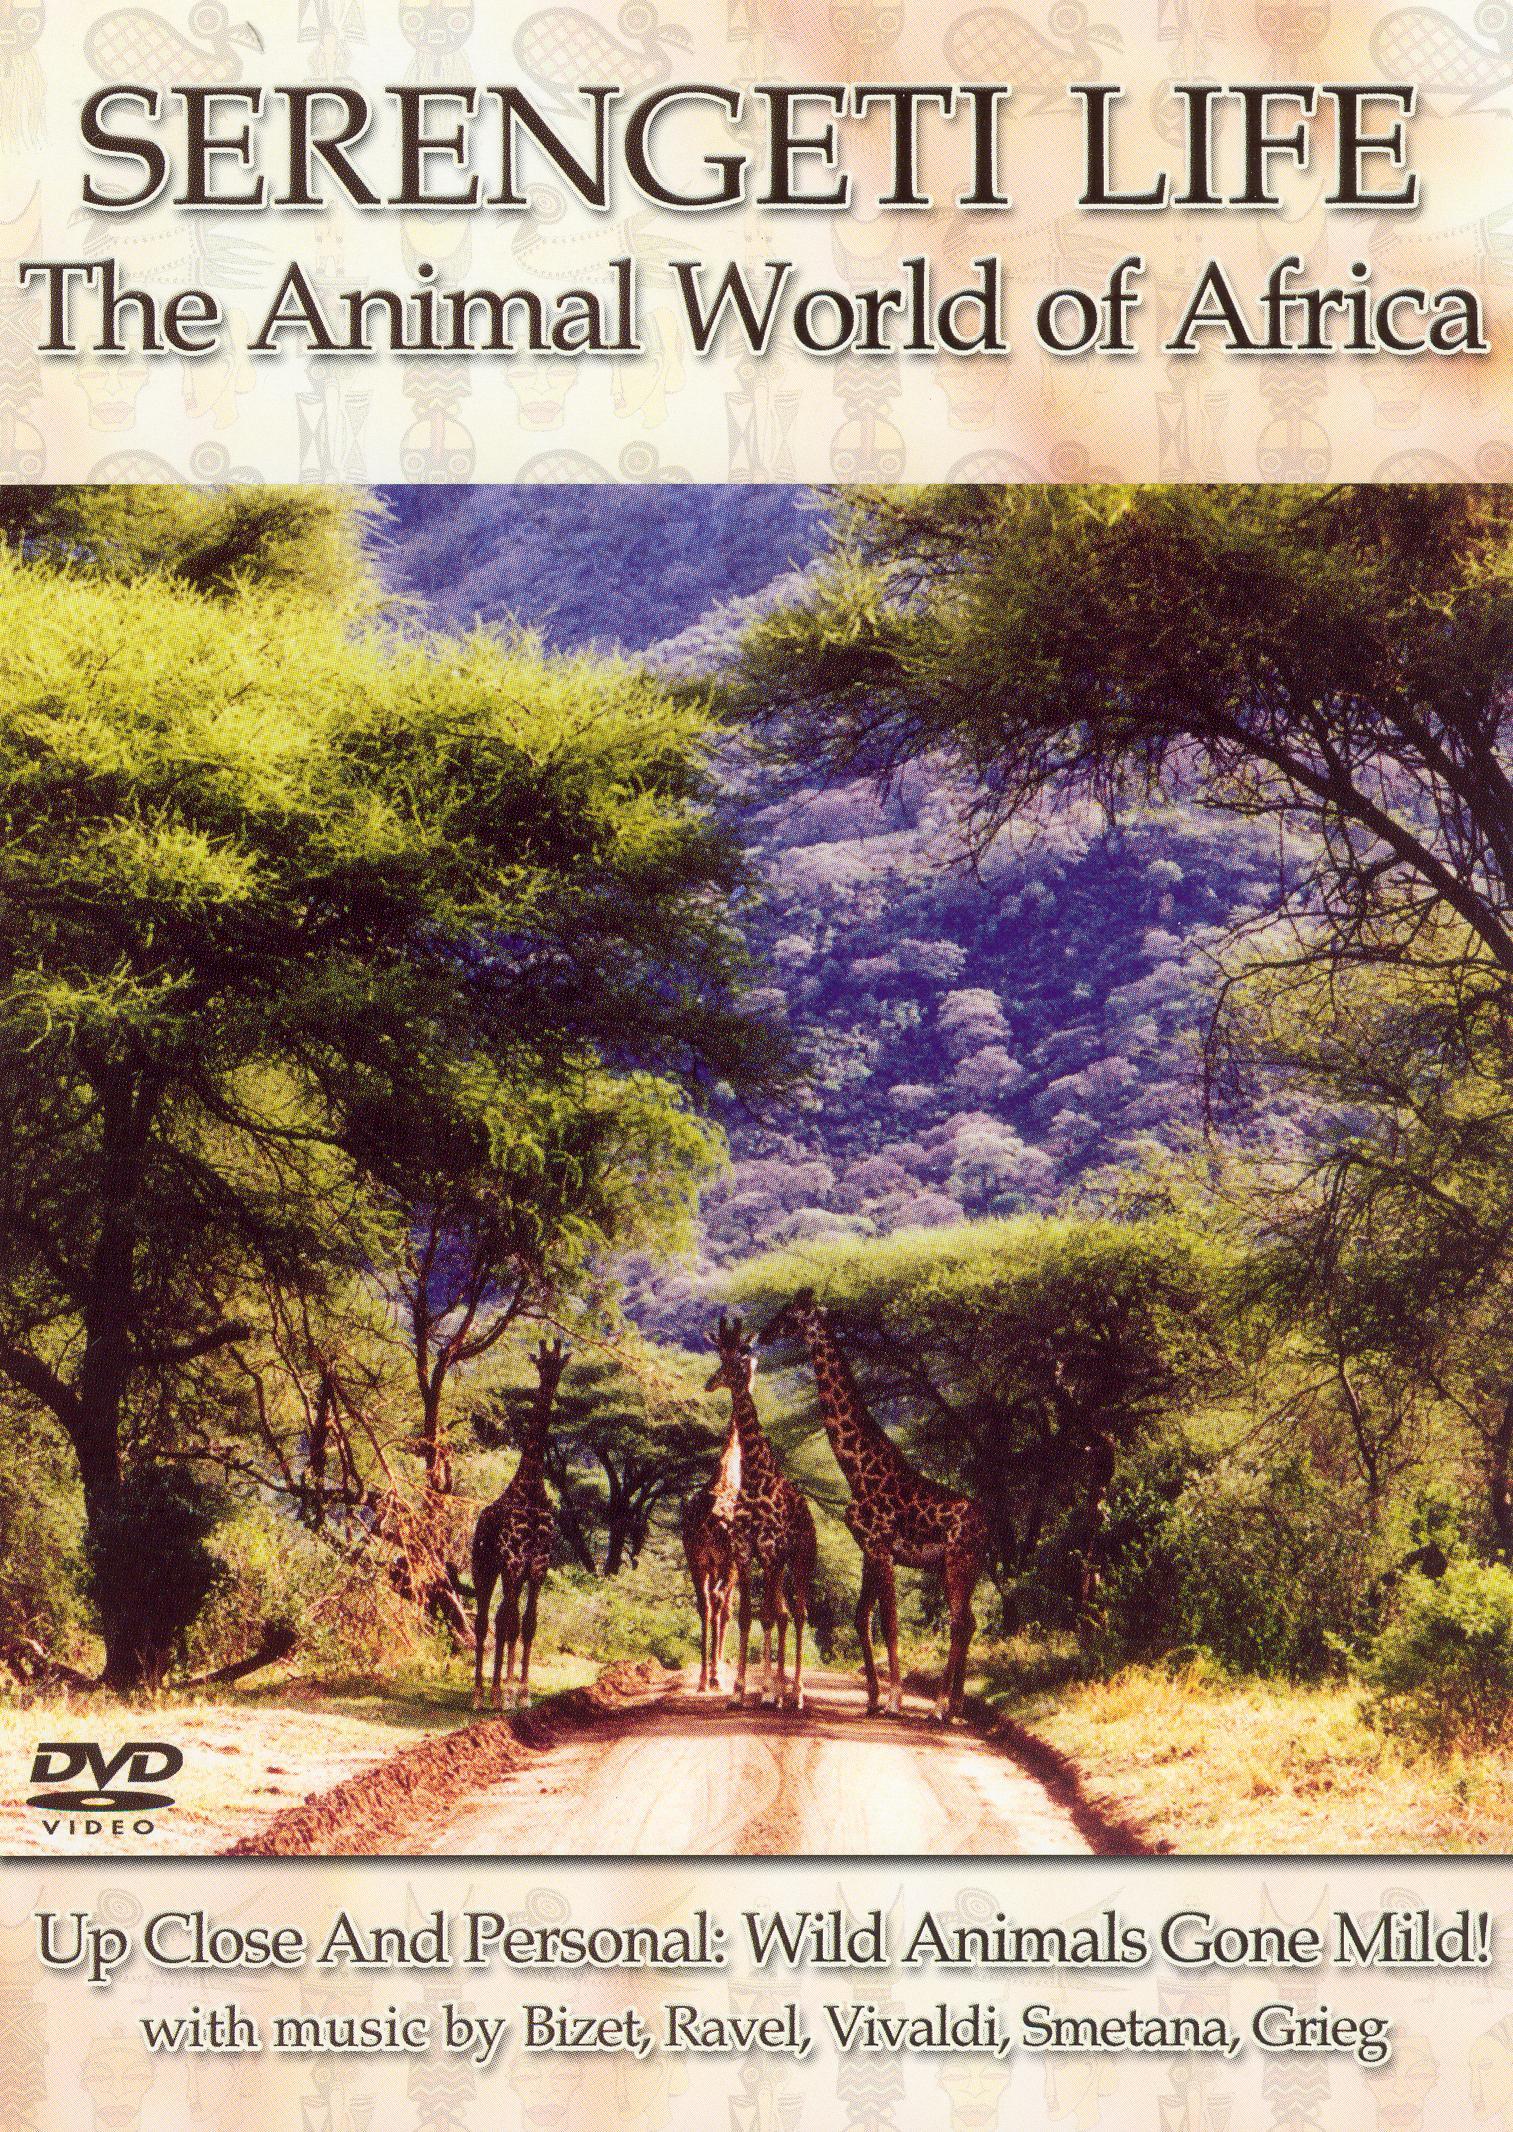 Serengeti Life: The Animal World of Africa